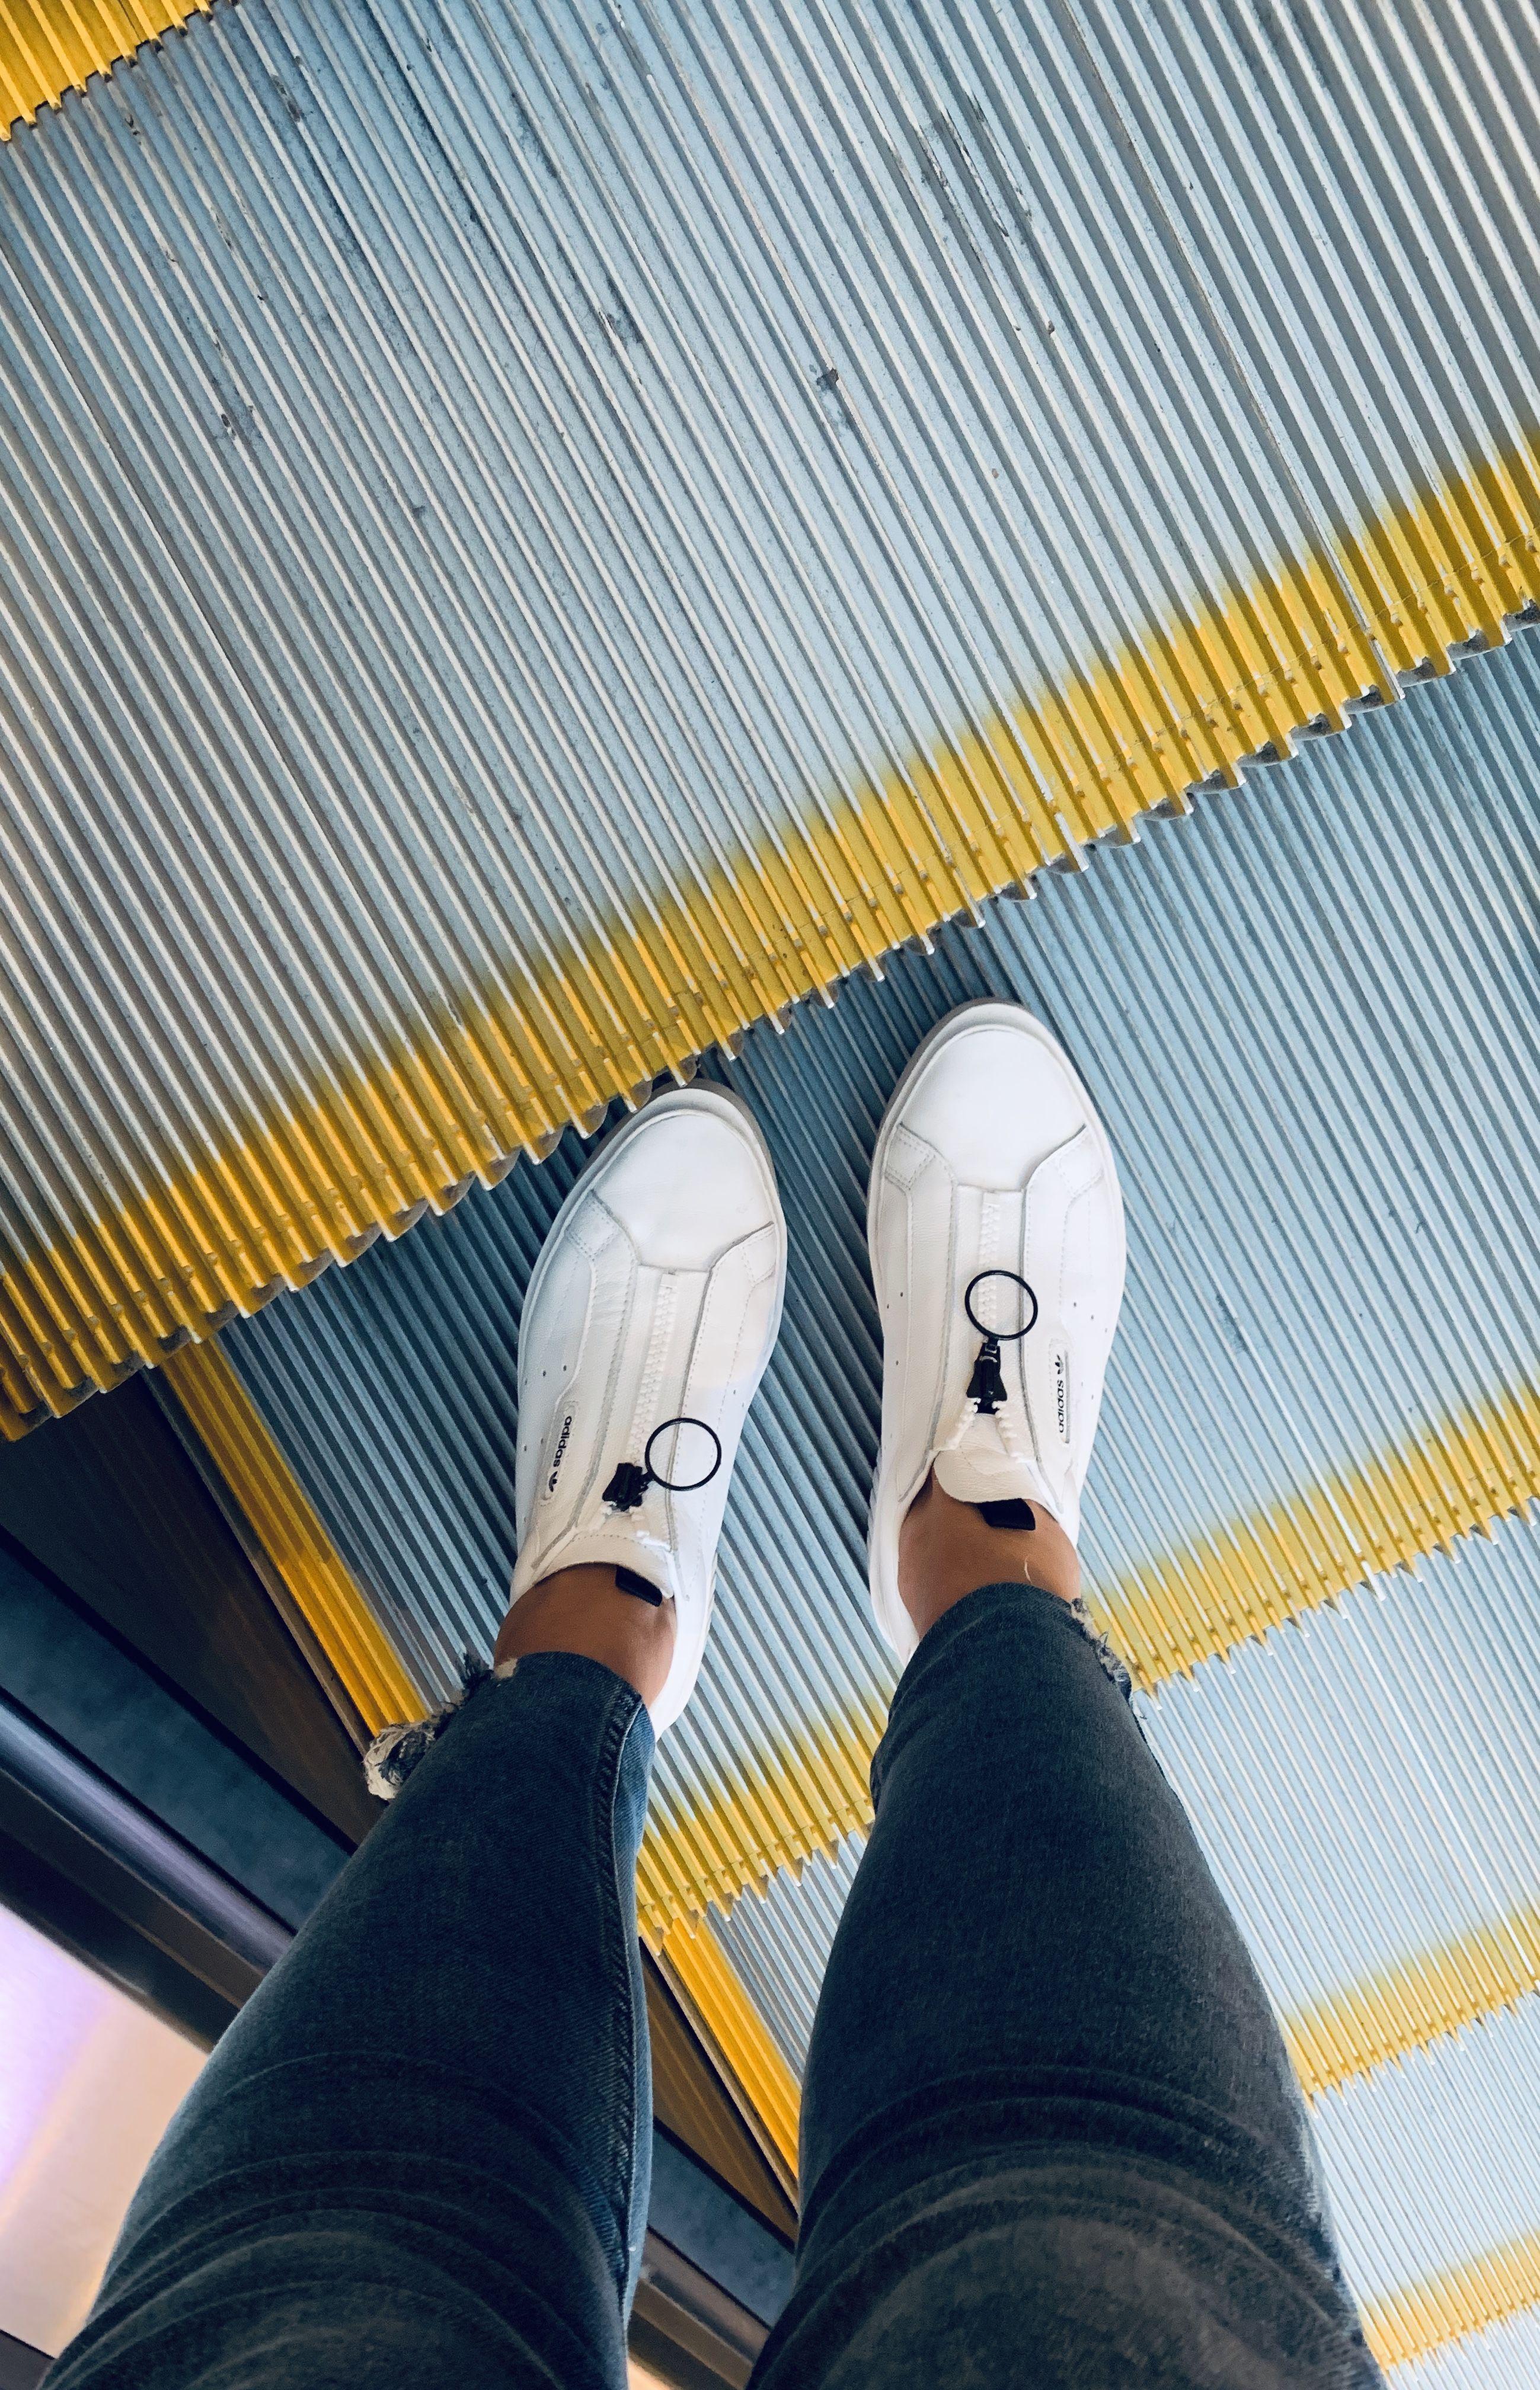 taburete pizarra interior  adidas Sleek Super Zip Shoes - White | adidas US | Shoes, Biker shorts  outfit, Adidas super